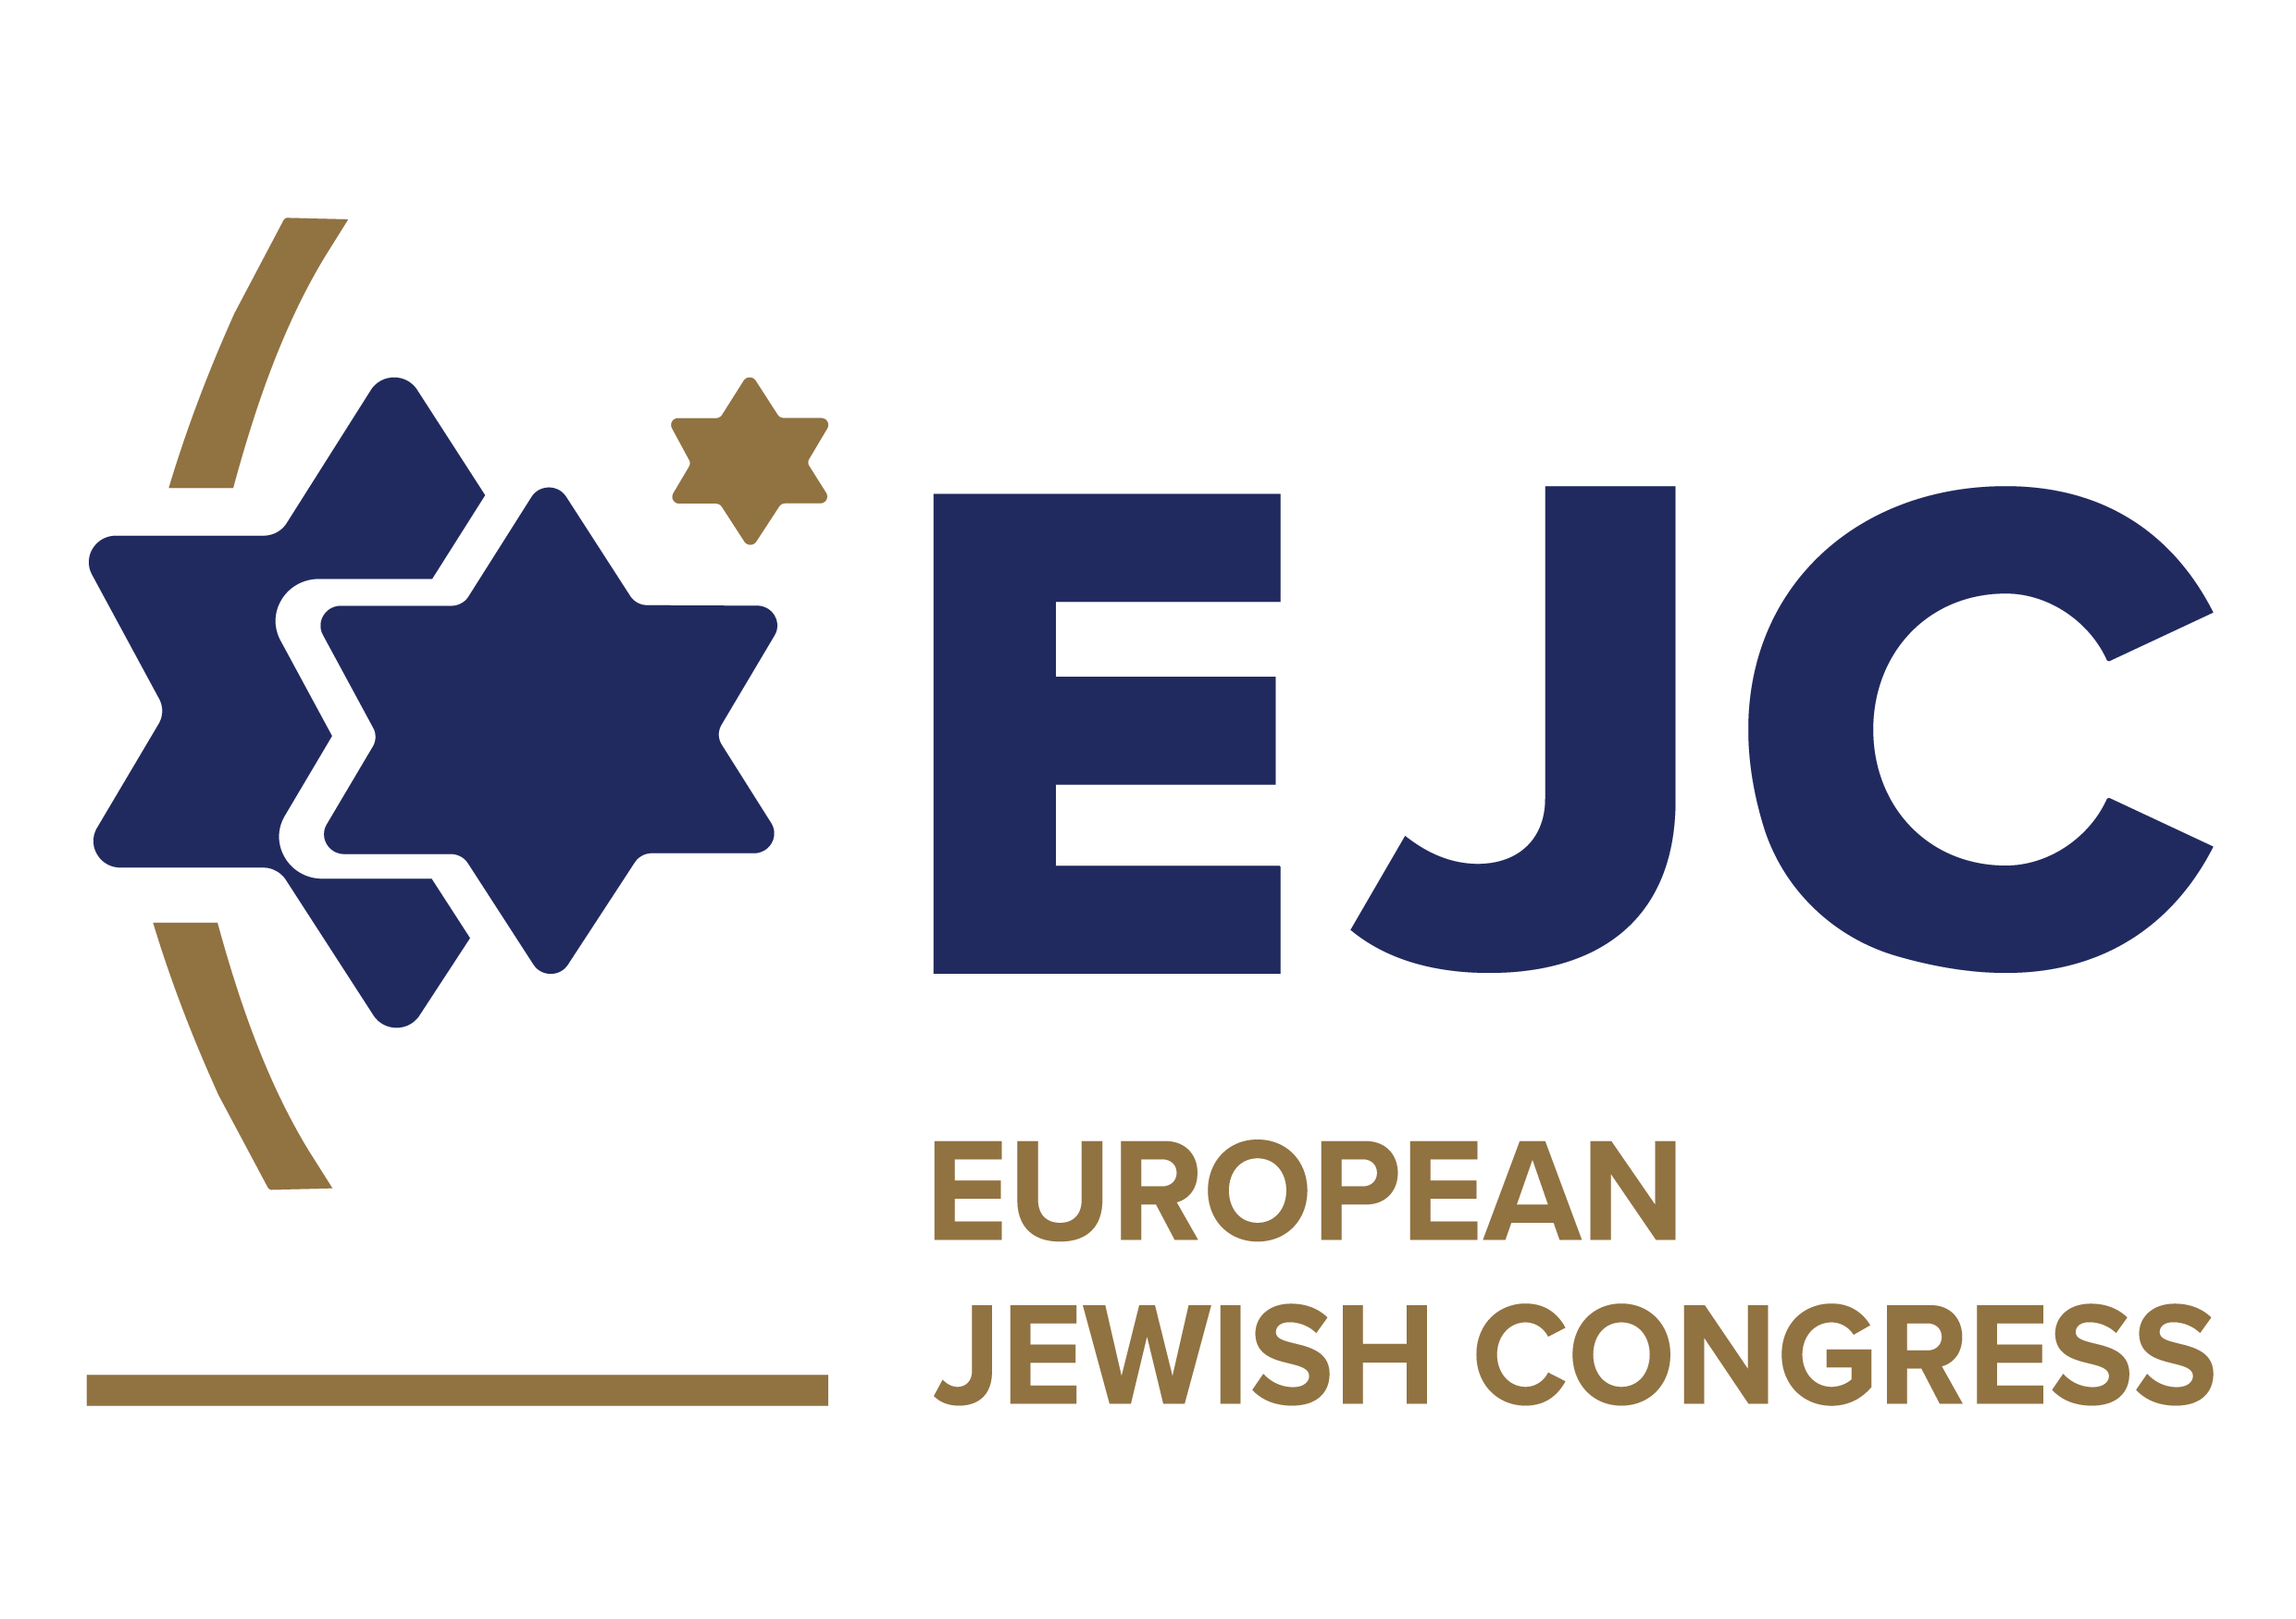 European Jewish Congress